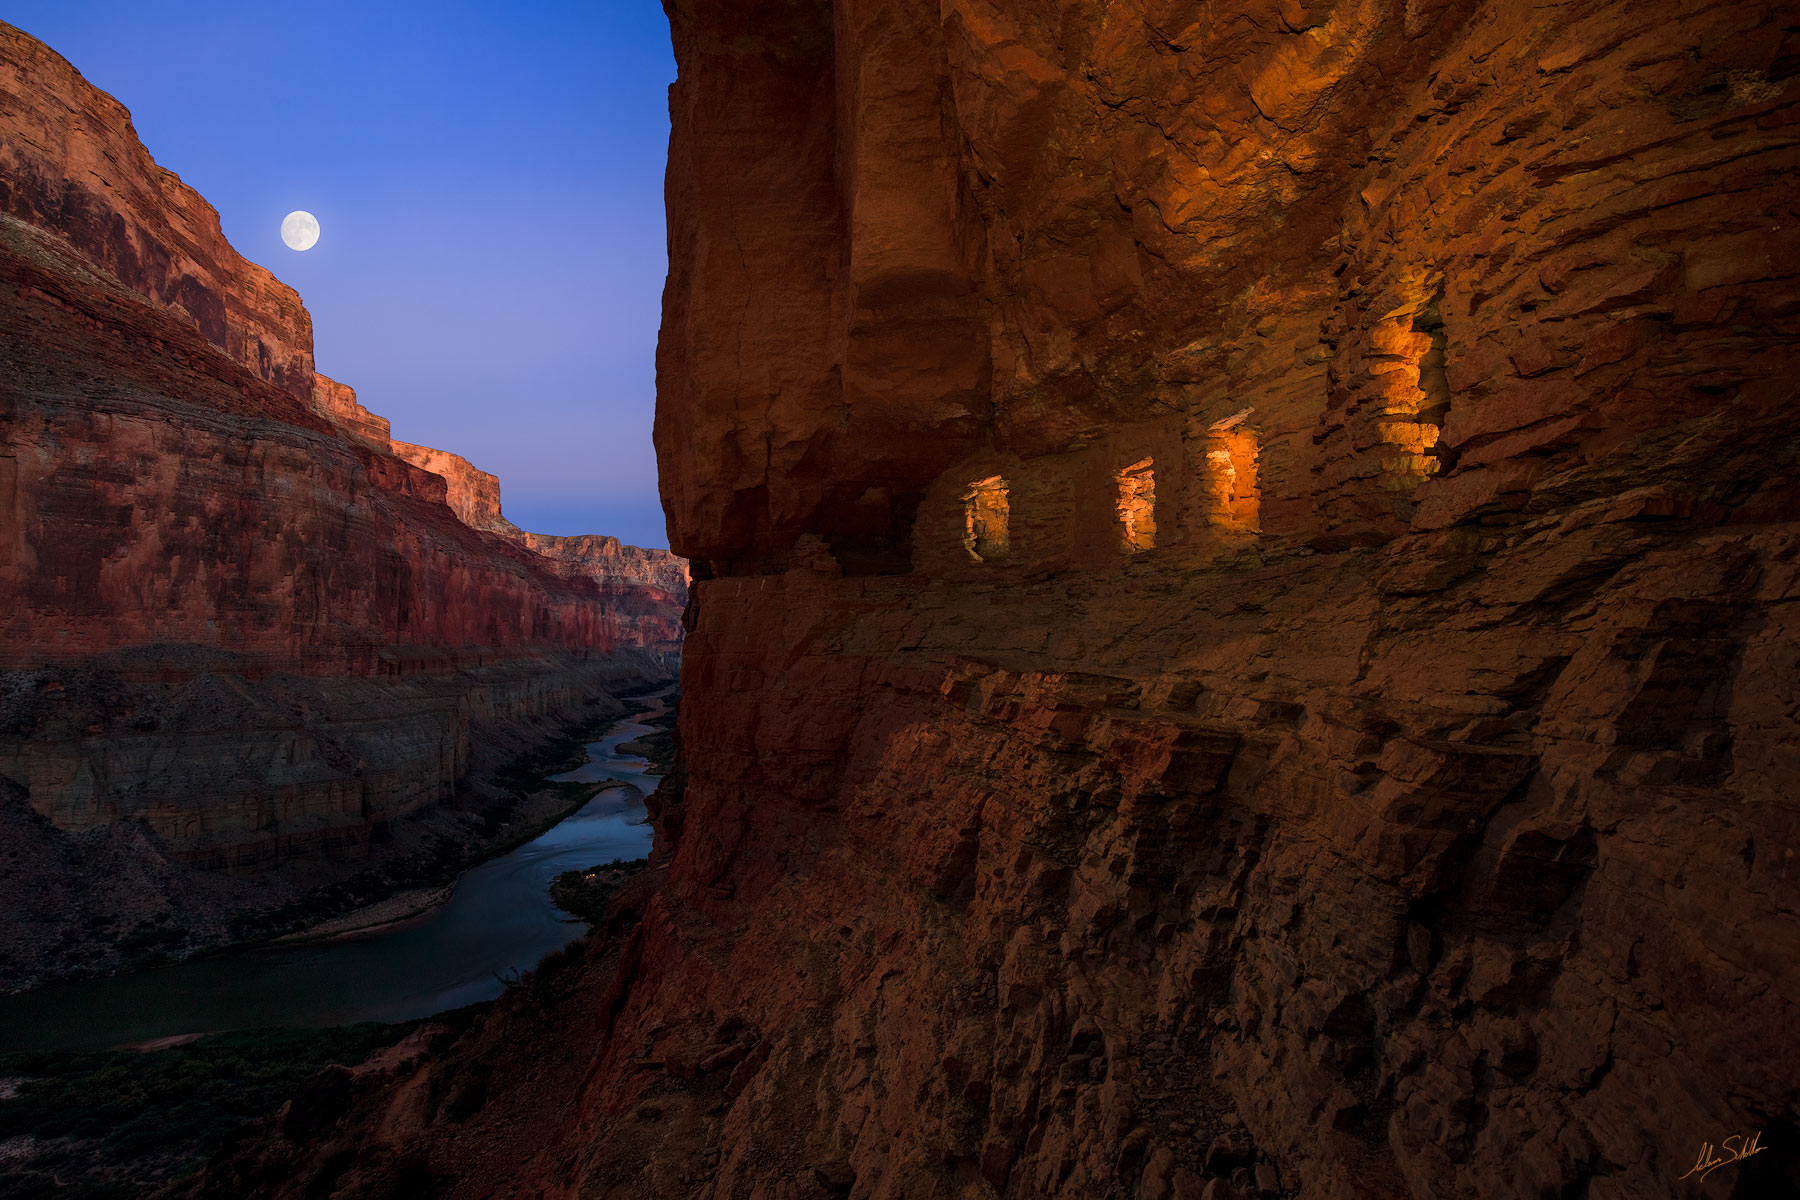 Arizona, Below the Rim, Colorado River, Expedition, Granaries, Grand Canyon, Grand Canyon National Park, Marble Canyon, Moon, Moonrise, Nankoweap, National Park, Native American, River Trip, Ruin,, photo